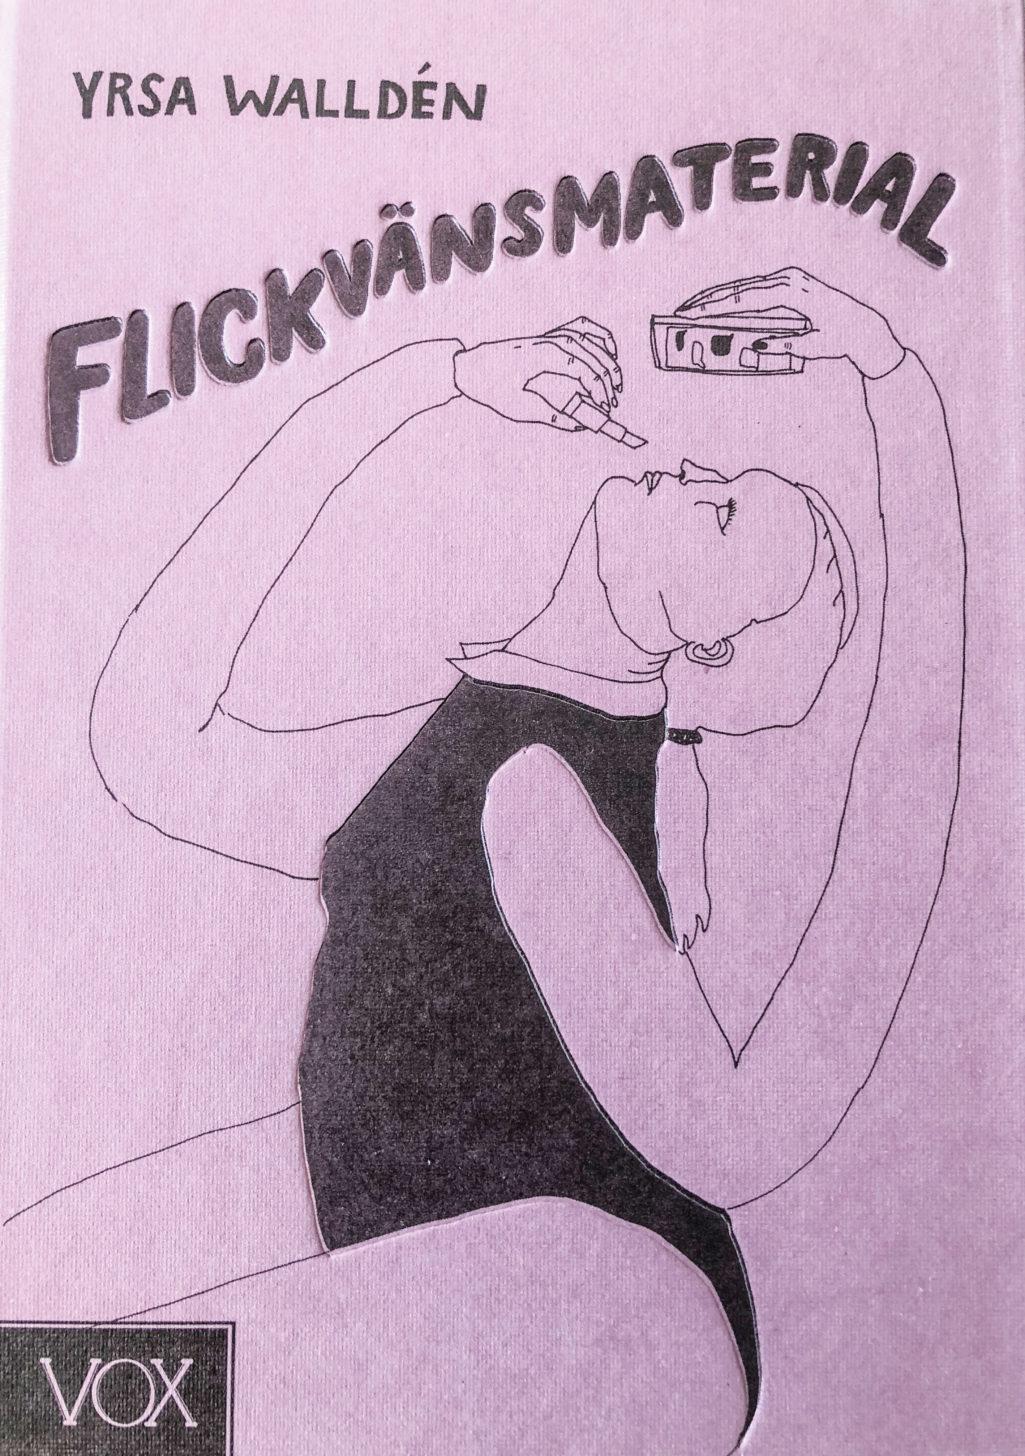 kflickvansmaterial-1